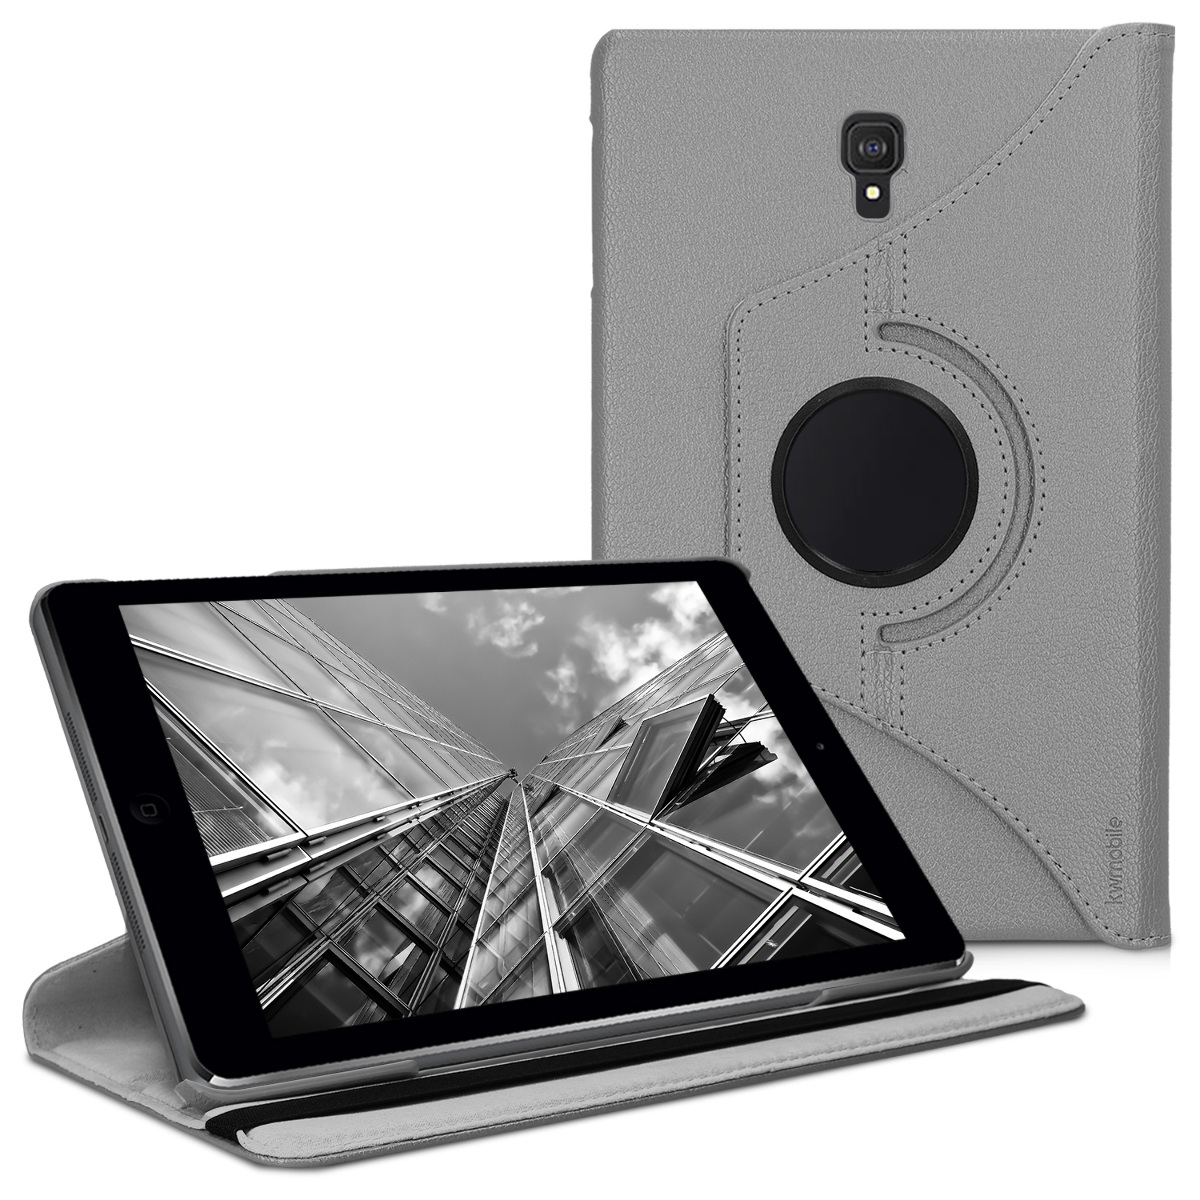 KW Θήκη 360° Samsung Galaxy Tab S4 10.5 - Anthracite (45998.73)